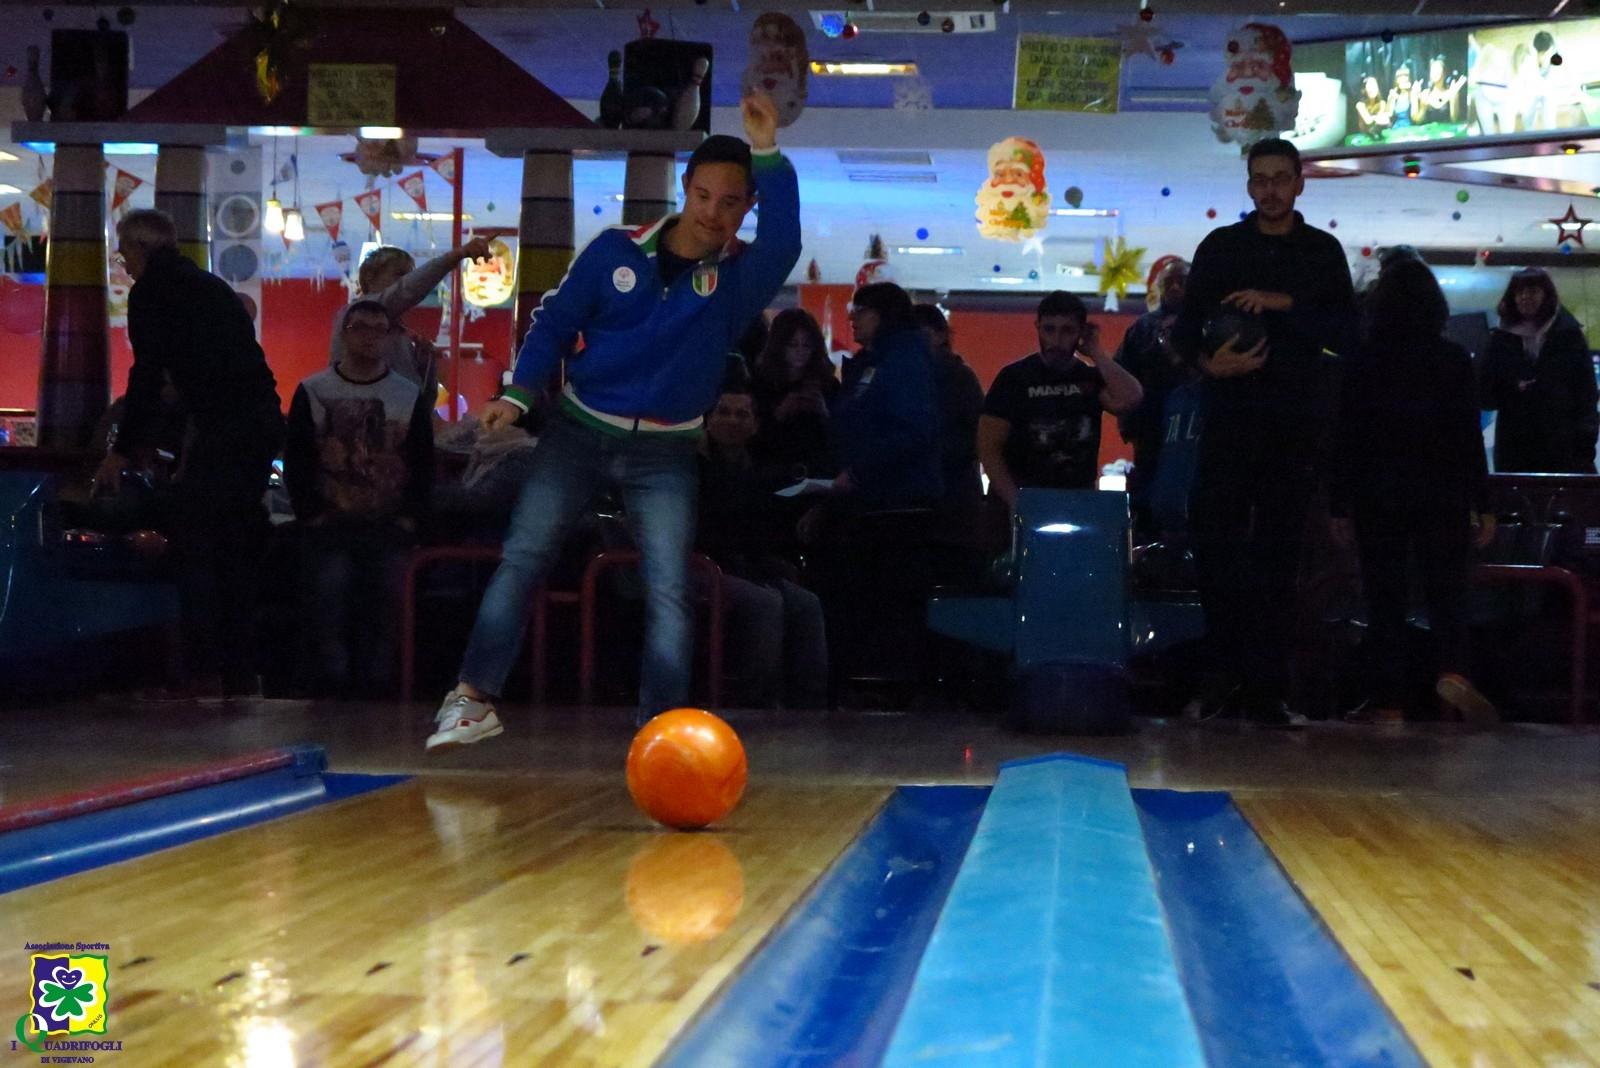 Torneo Bowling Vigevano 19-12-2018 - 017